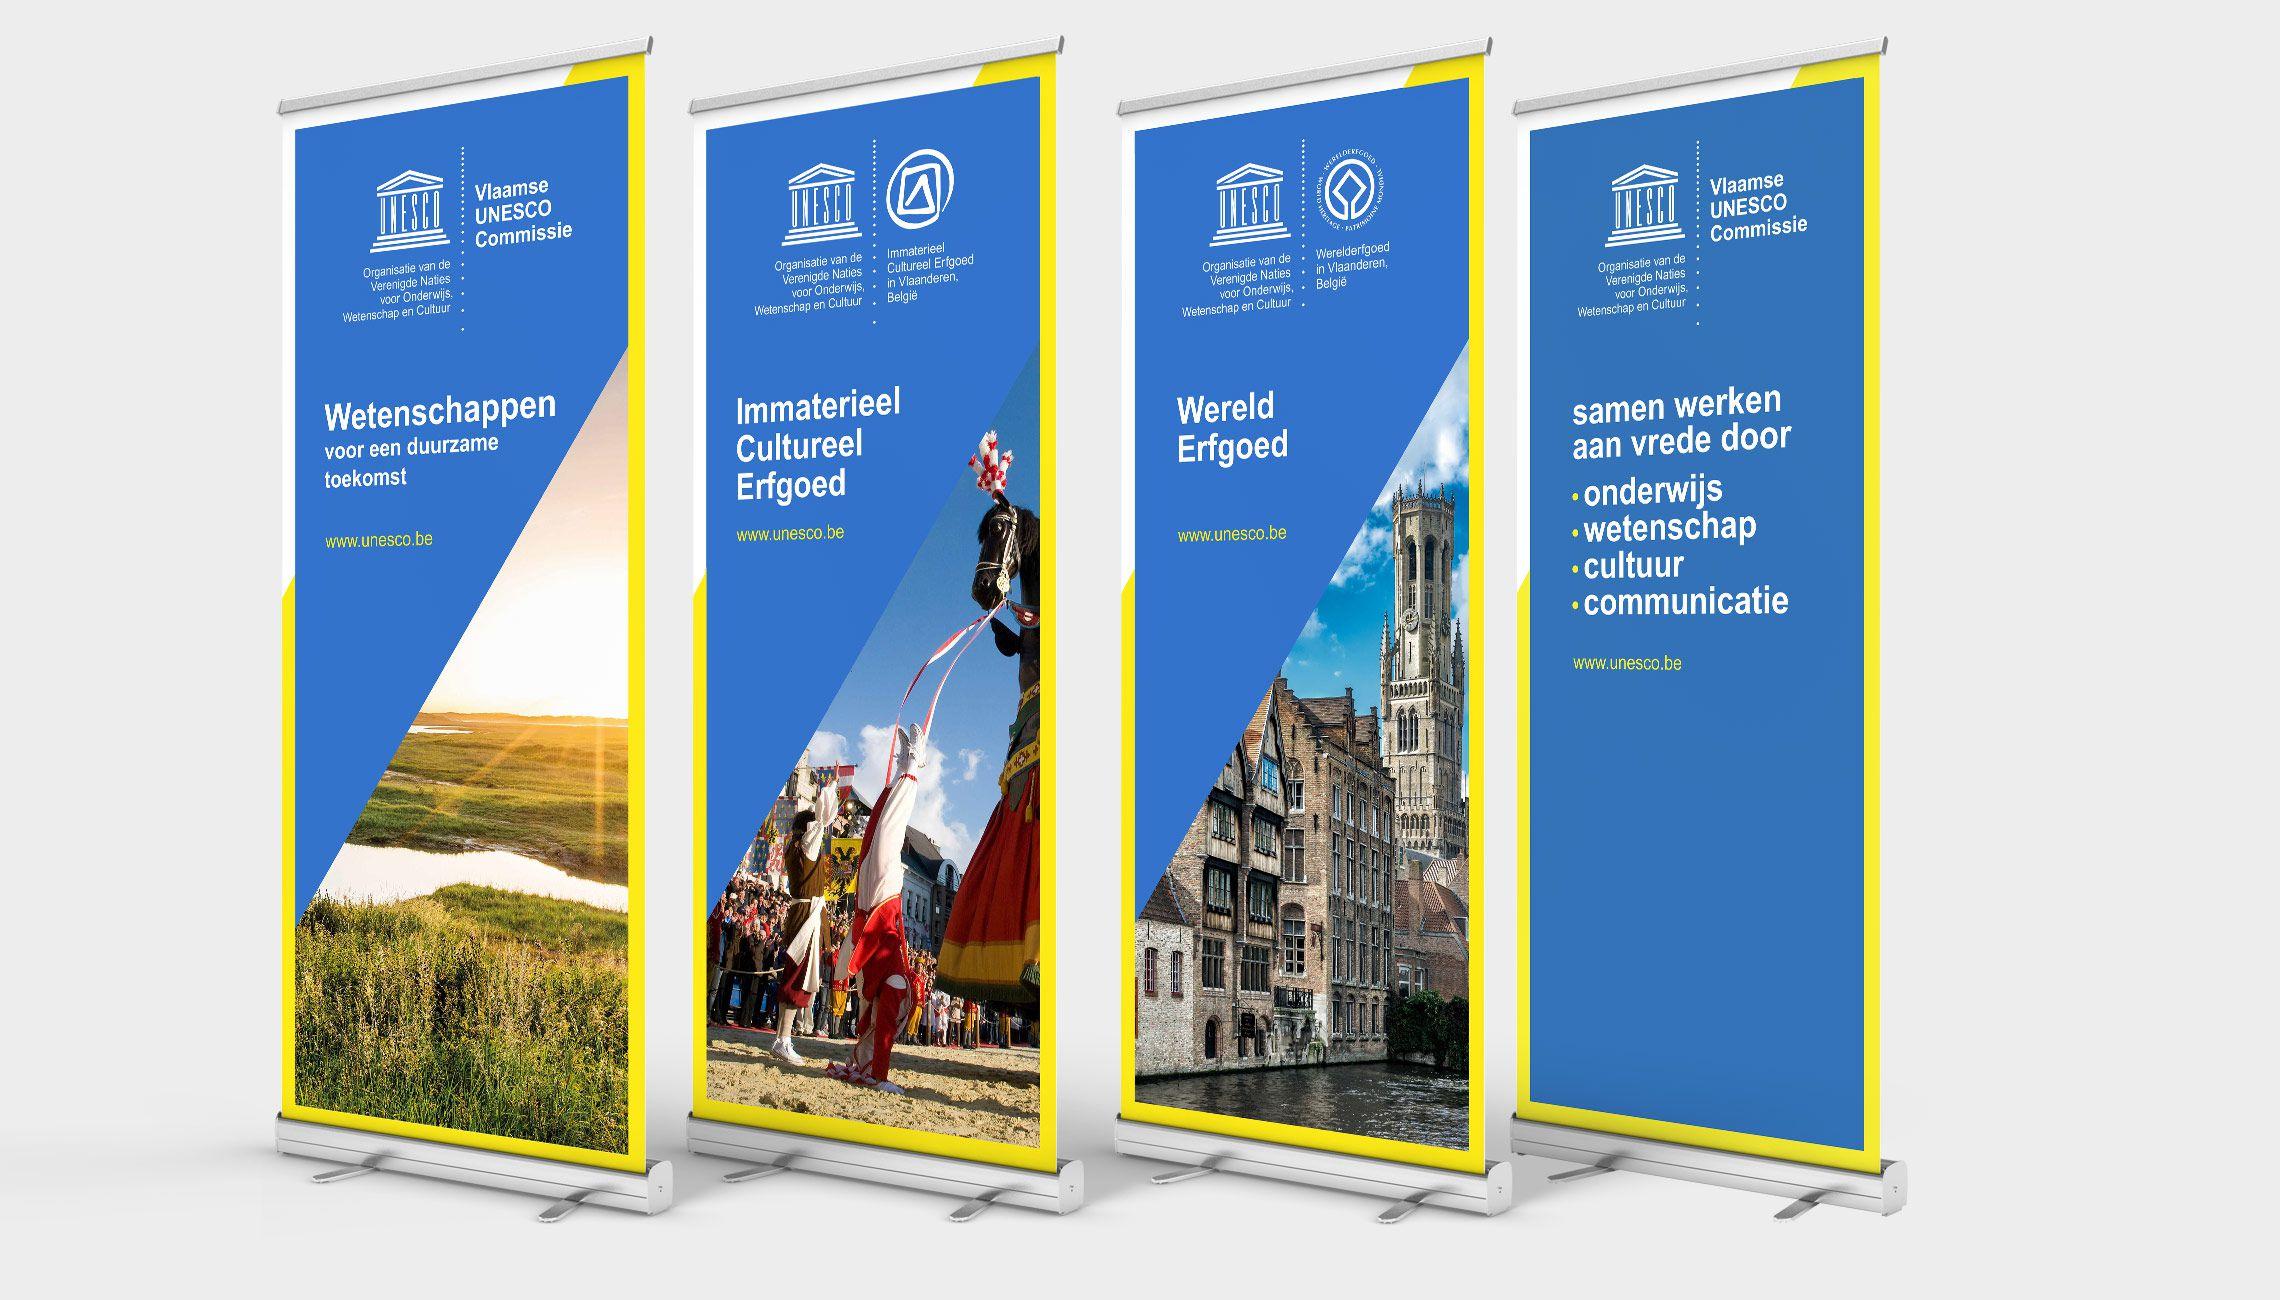 identity: Visual identity UNESCO-Flanders - image 1